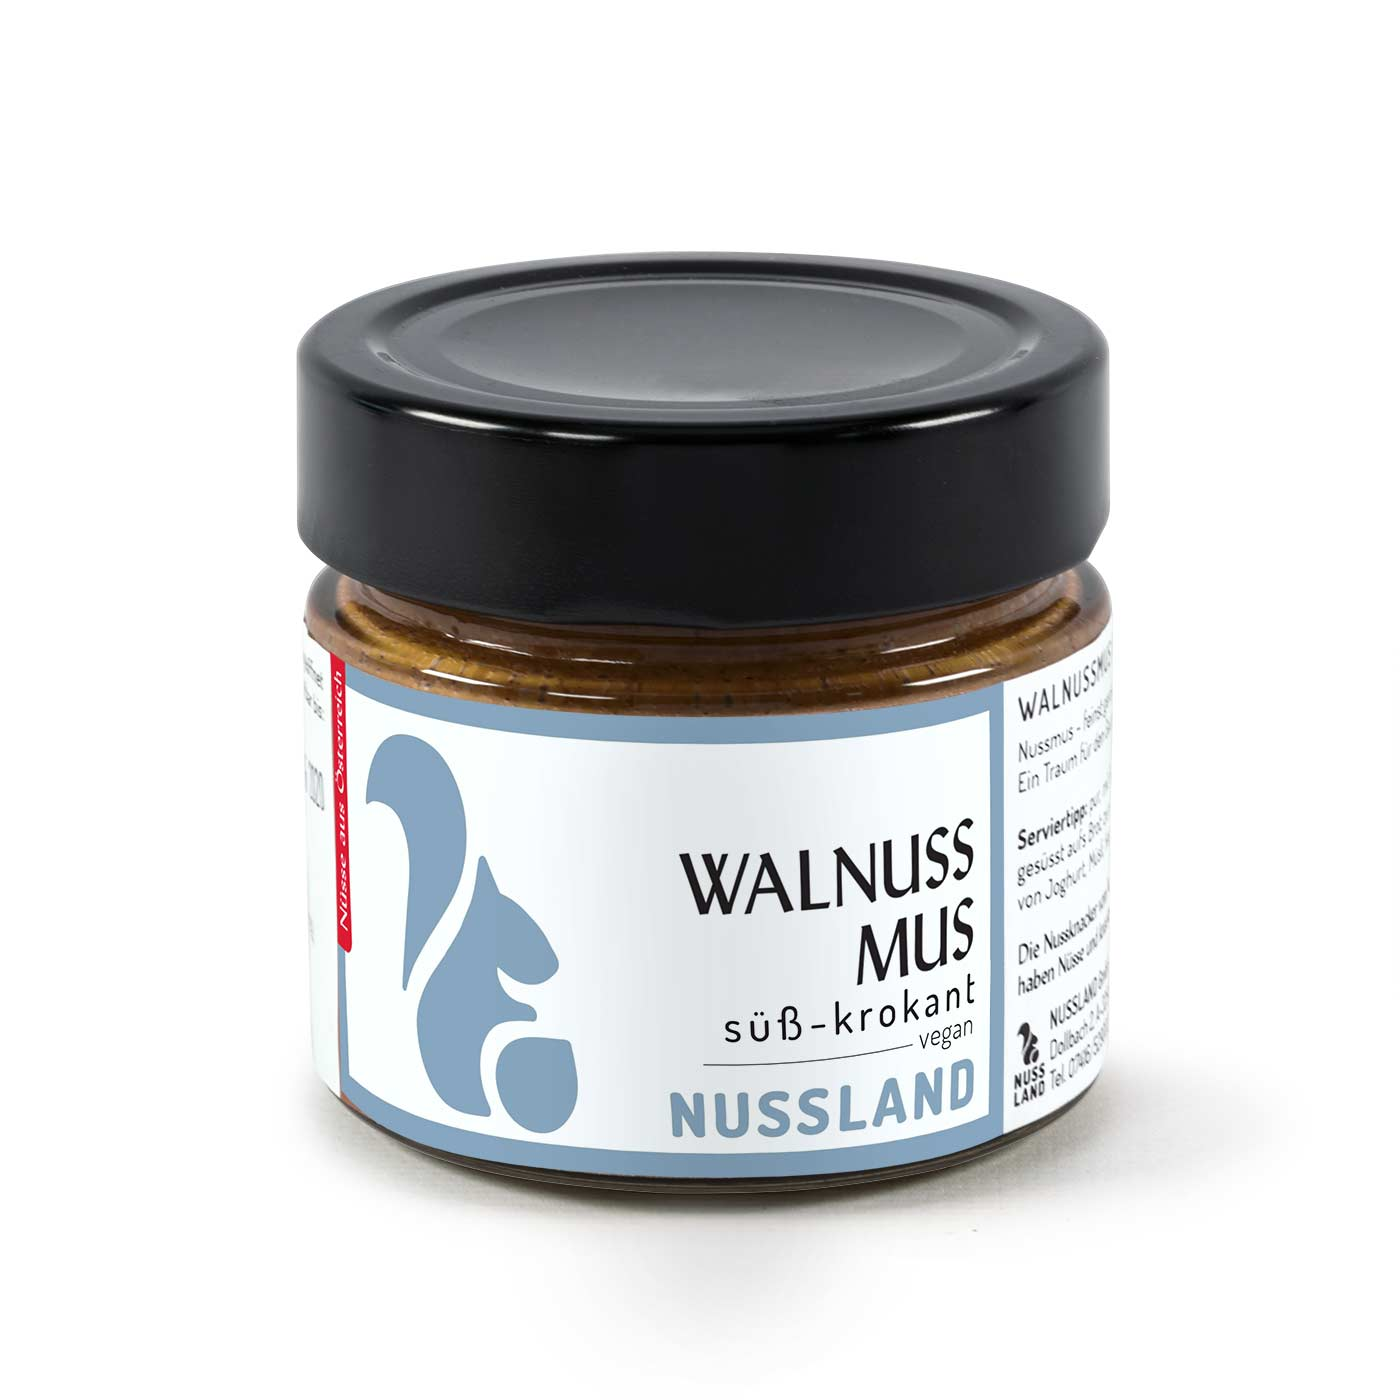 Walnuss-Mus 'Süß – krokant'